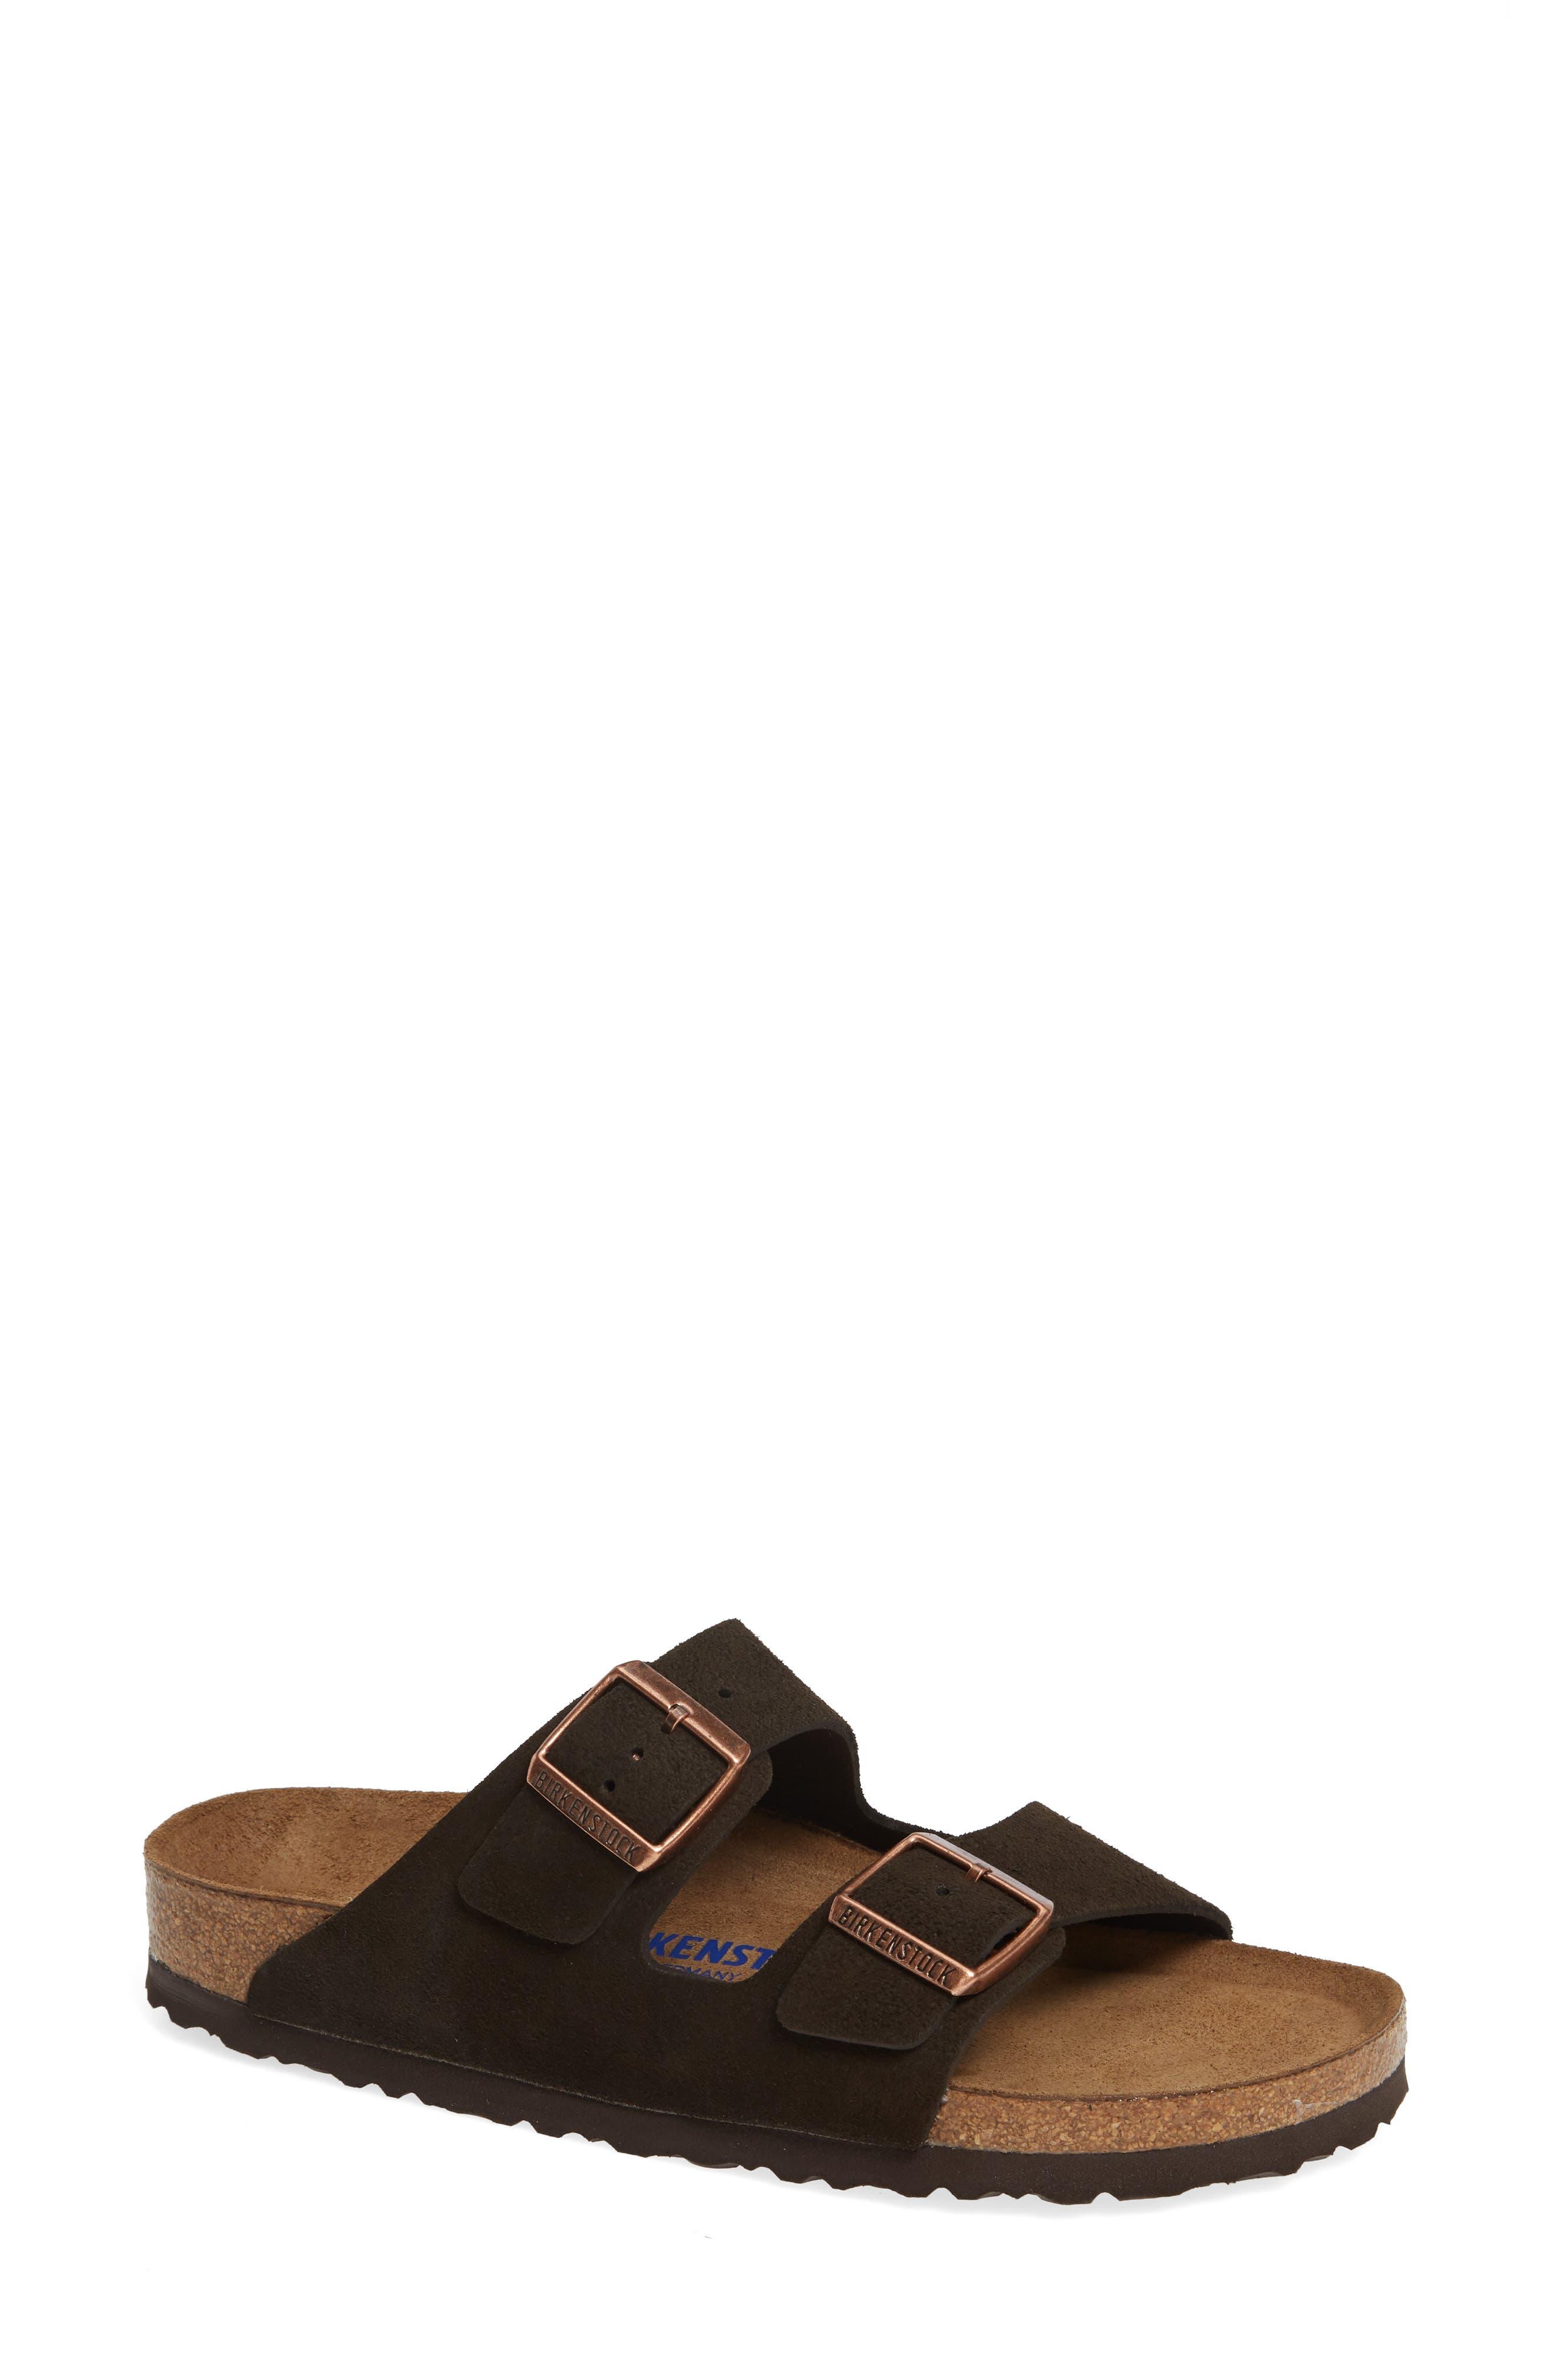 'Arizona' Soft Footbed Suede Sandal, Main, color, MOCHA SUEDE